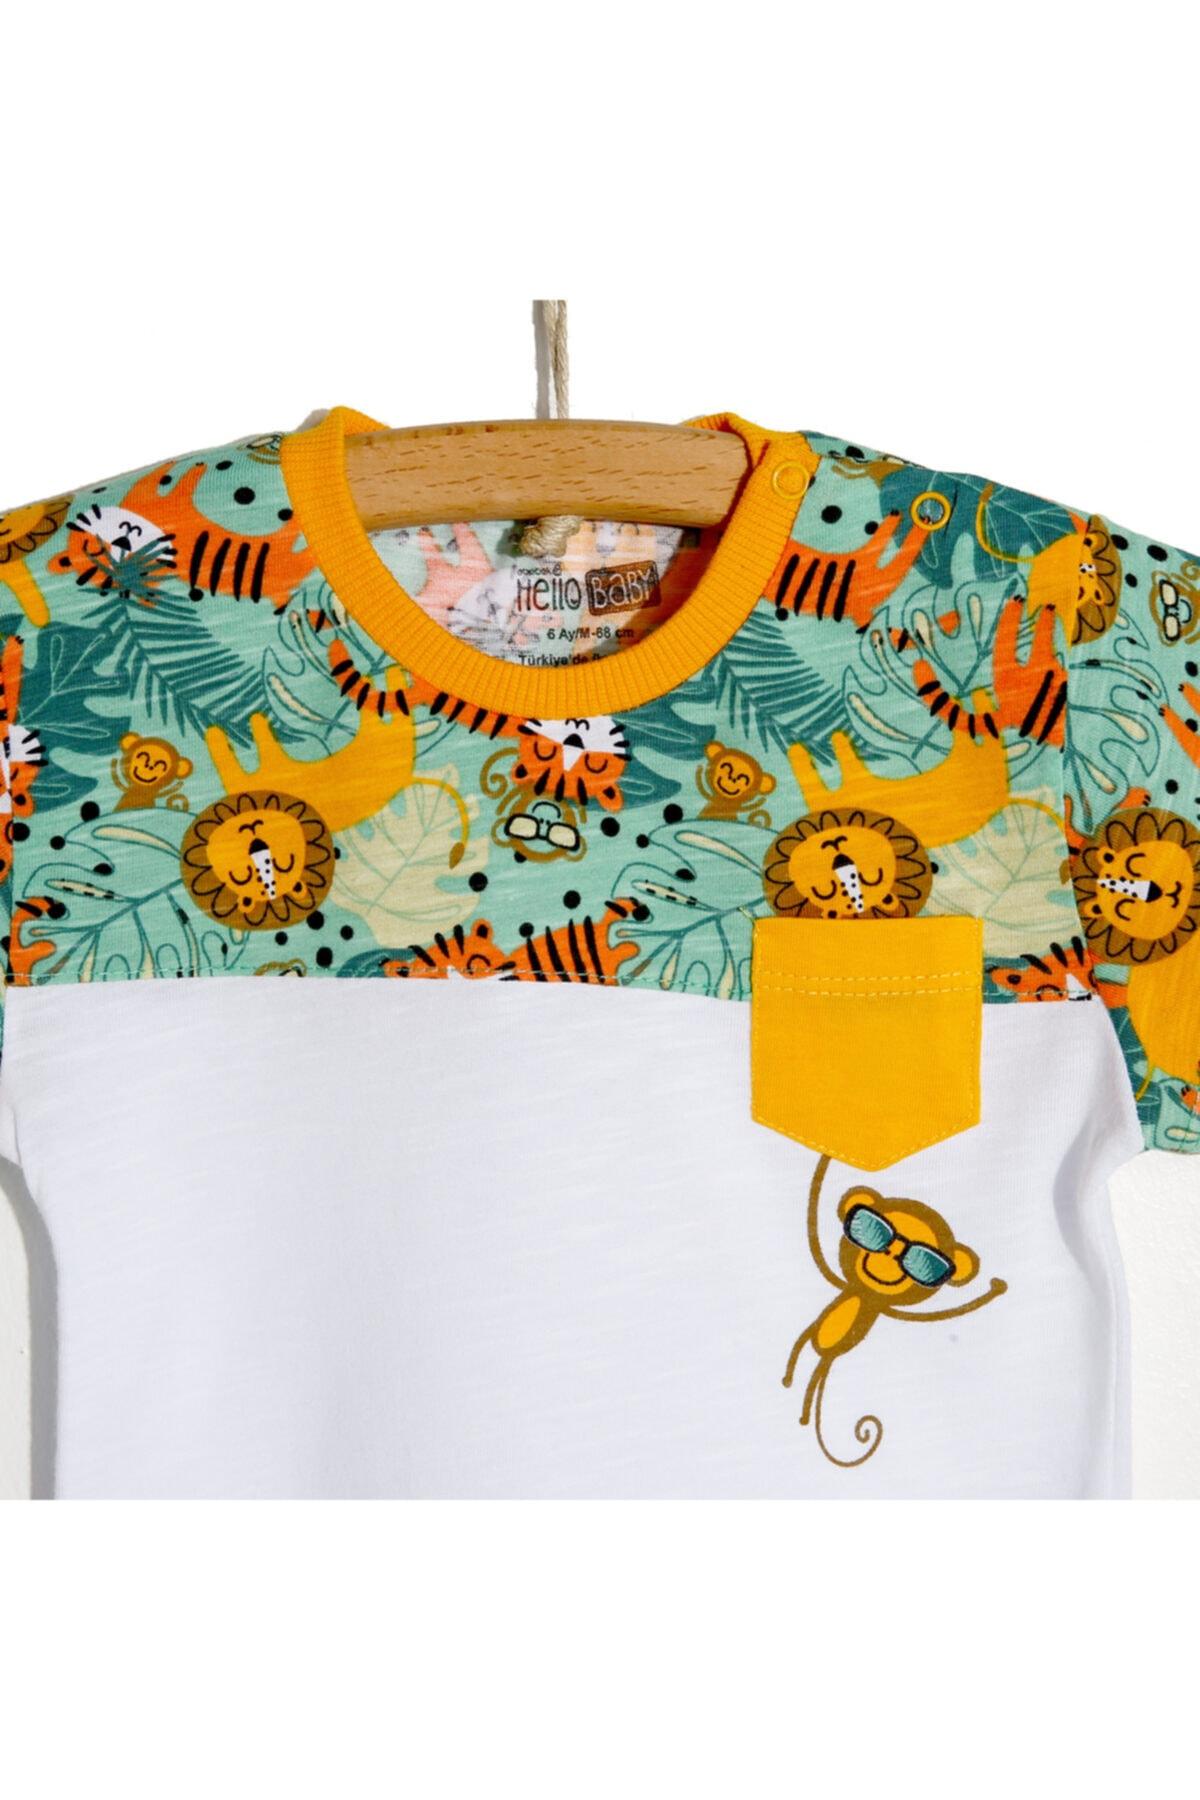 خرید ارزان تیشرت نوزاد پسرانه اسپرت برند HelloBaby کد ty122982739